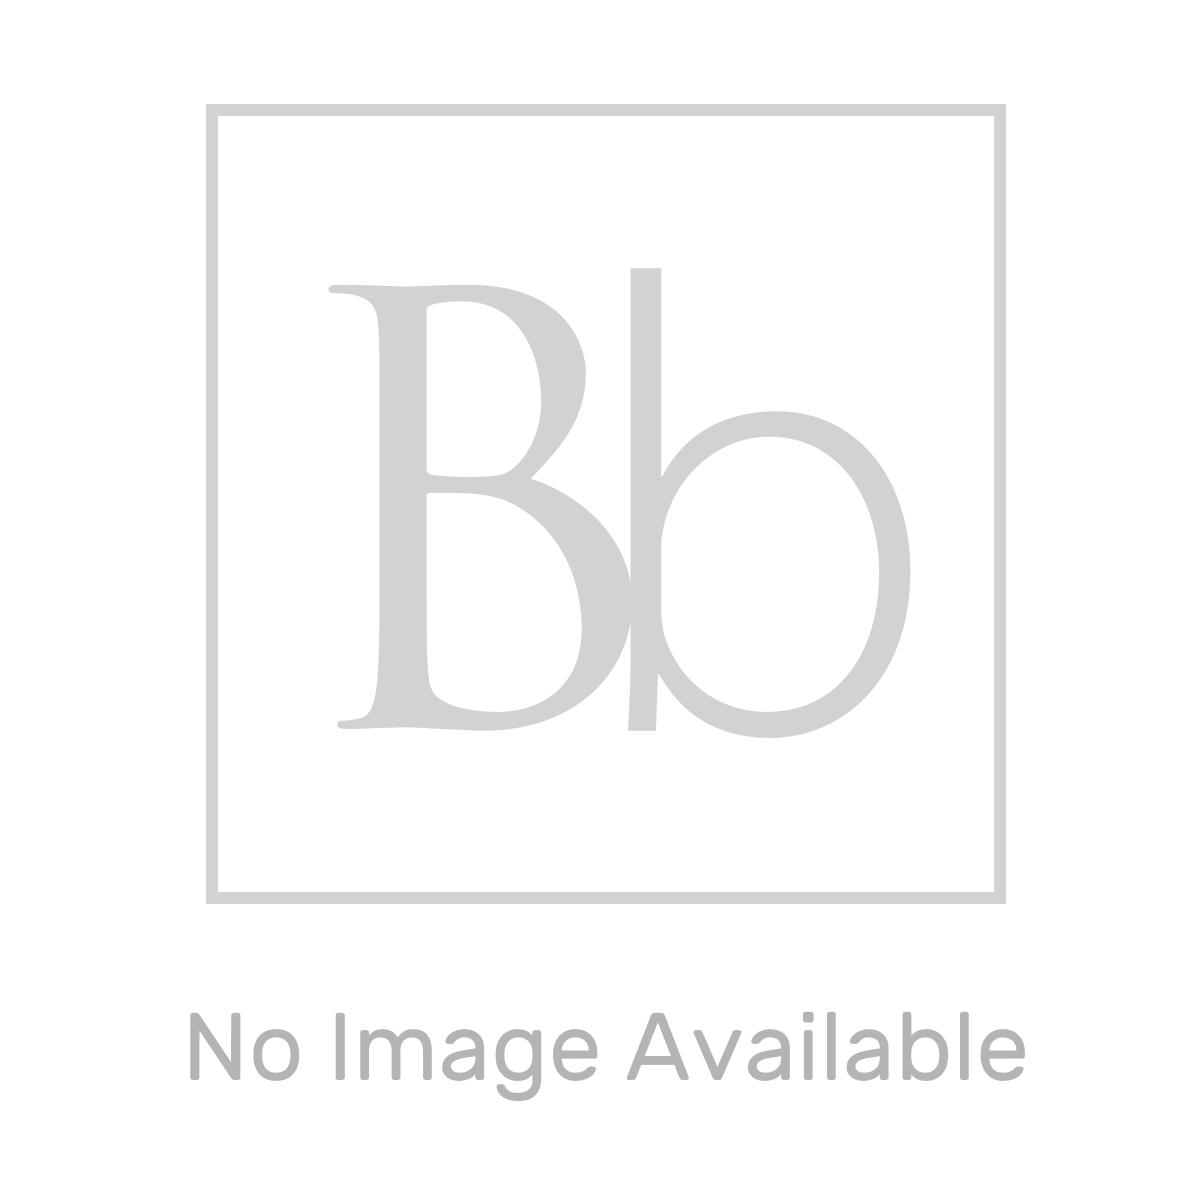 Stuart Turner 46451 PH 35 ES Peripheral Pump